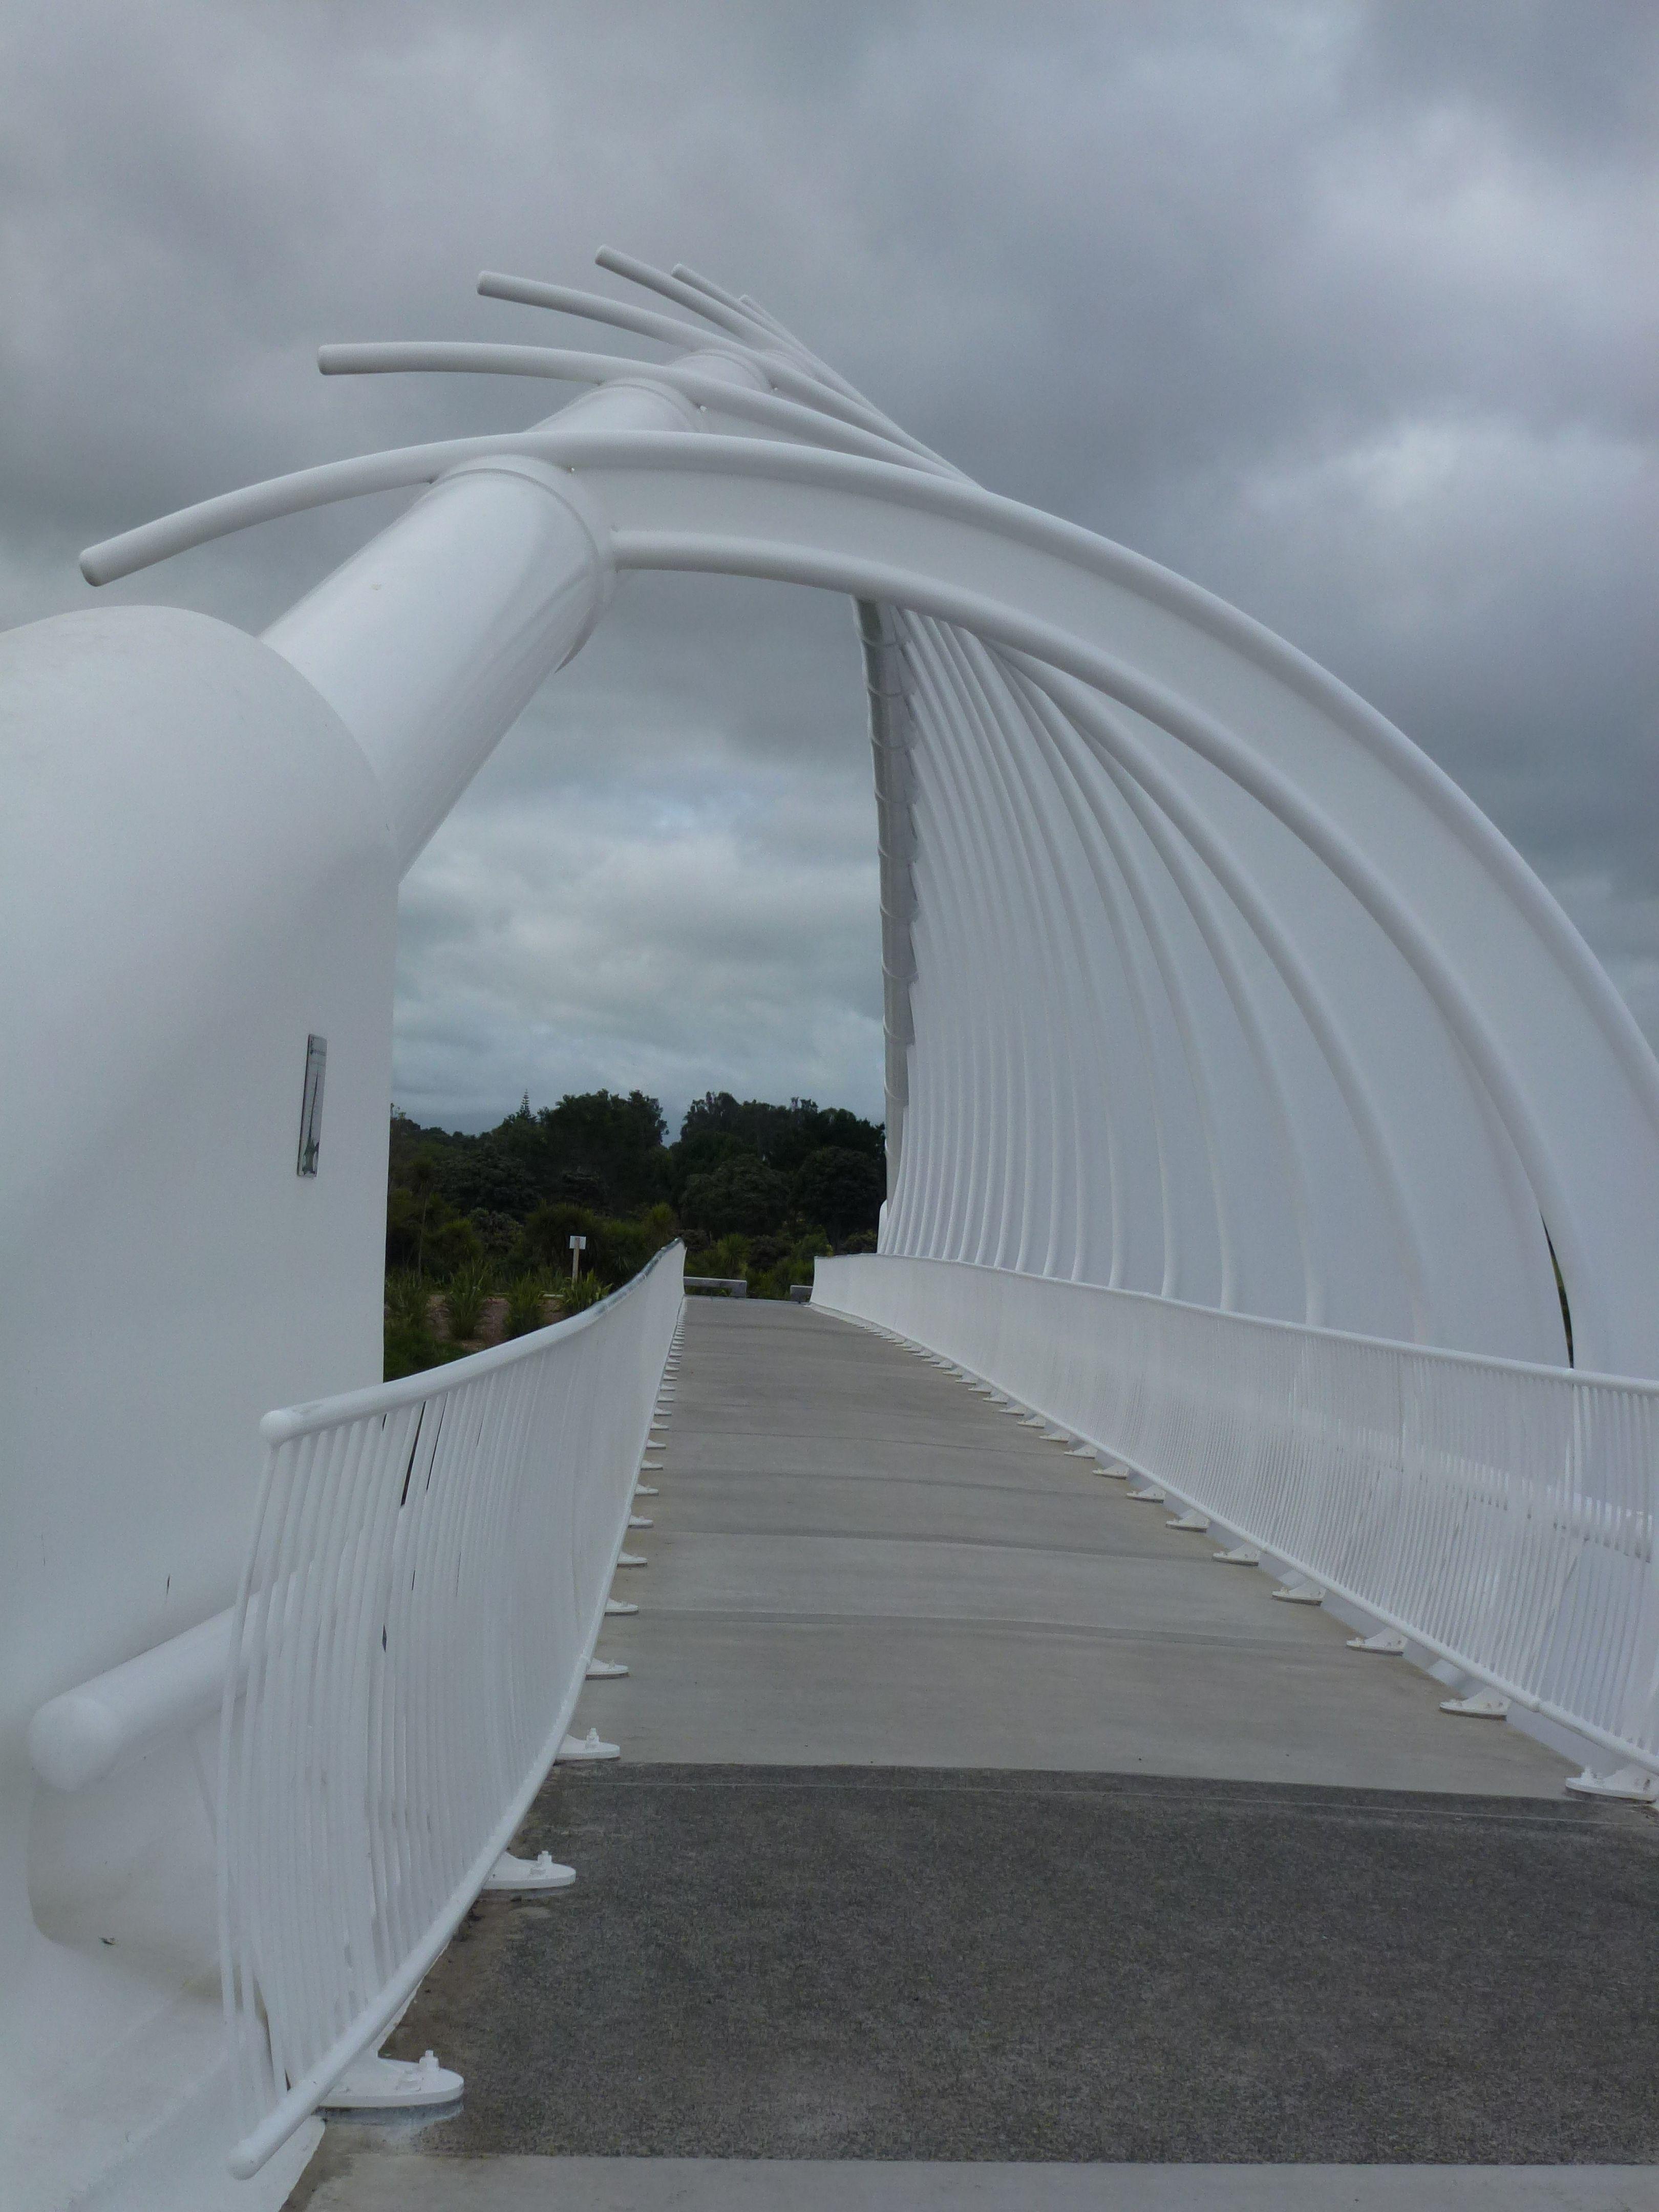 Rewarewa Bridge, New Plymouth, Taranaki, New Zealand